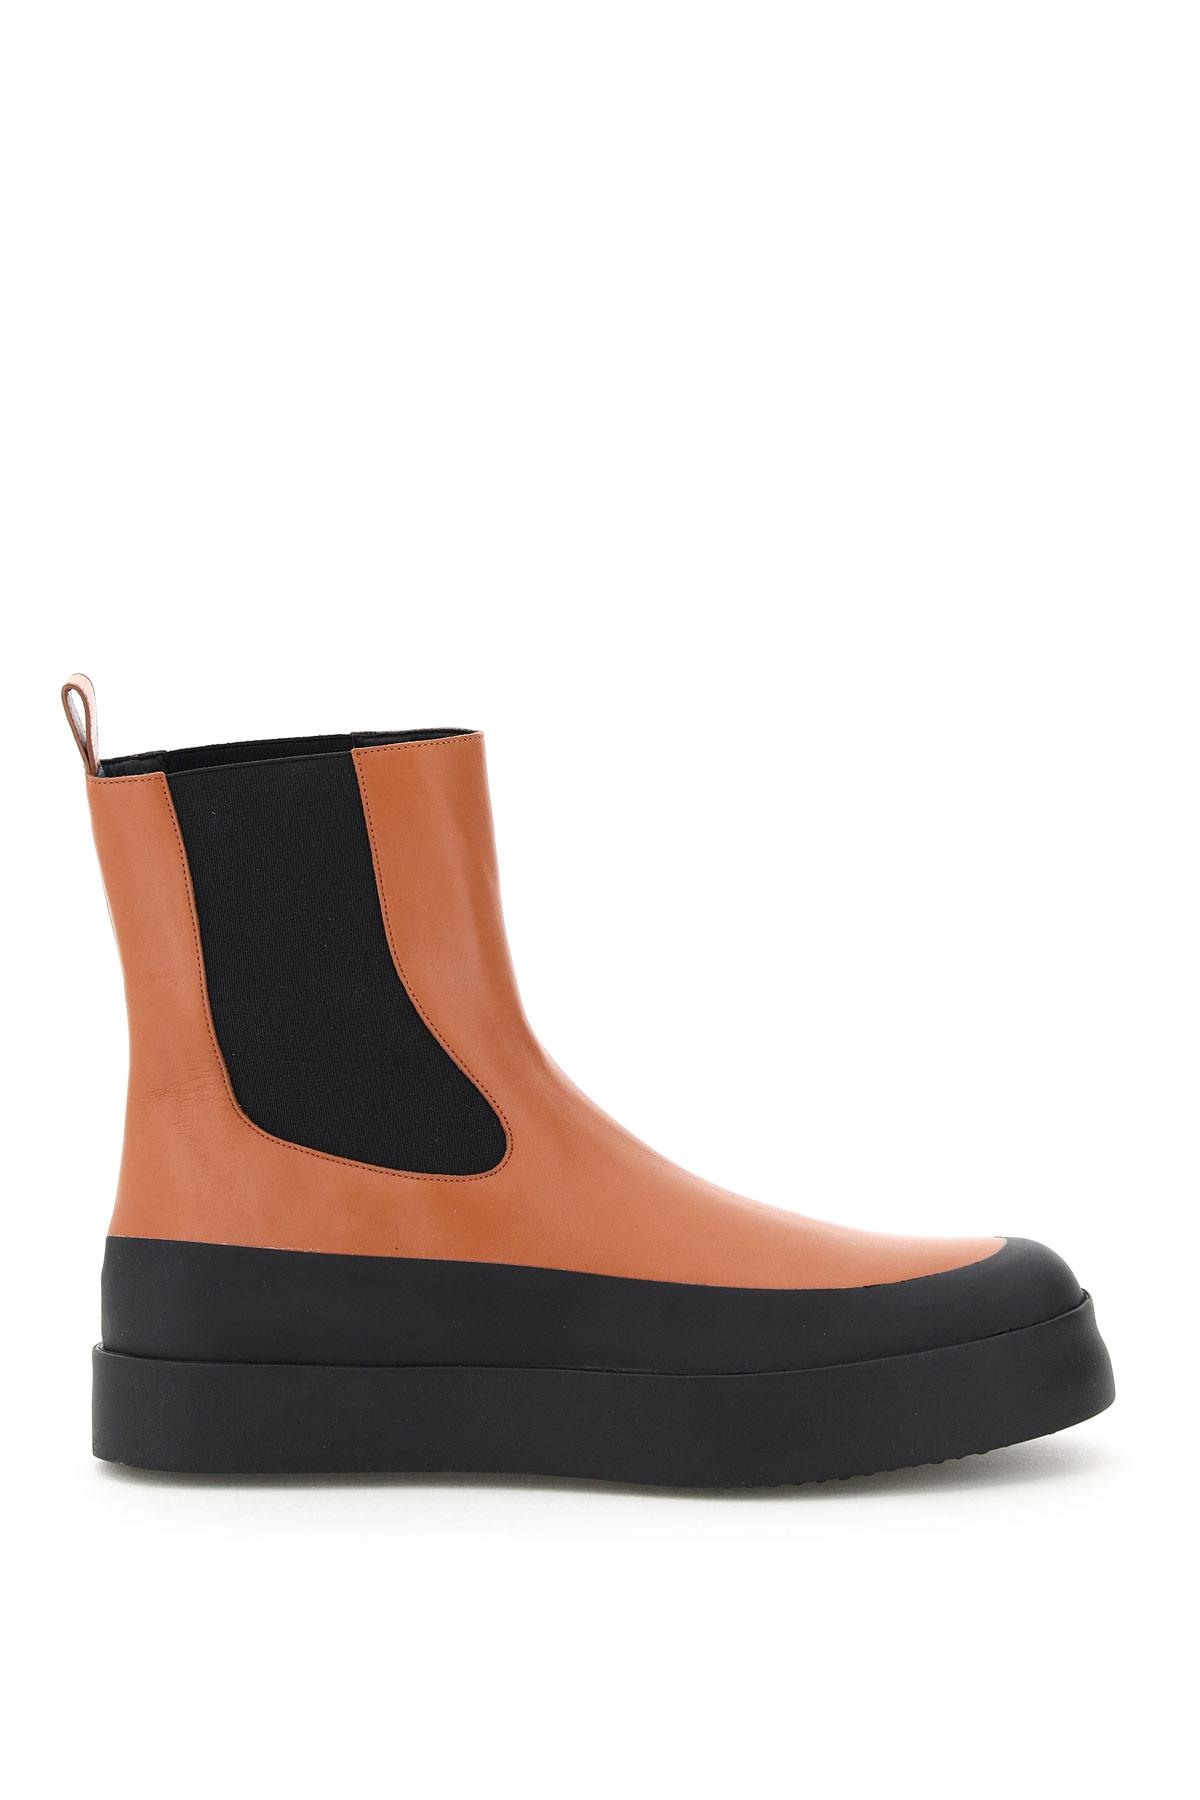 NEOUS ZANIAH BOOTS 35 Brown, Black Leather